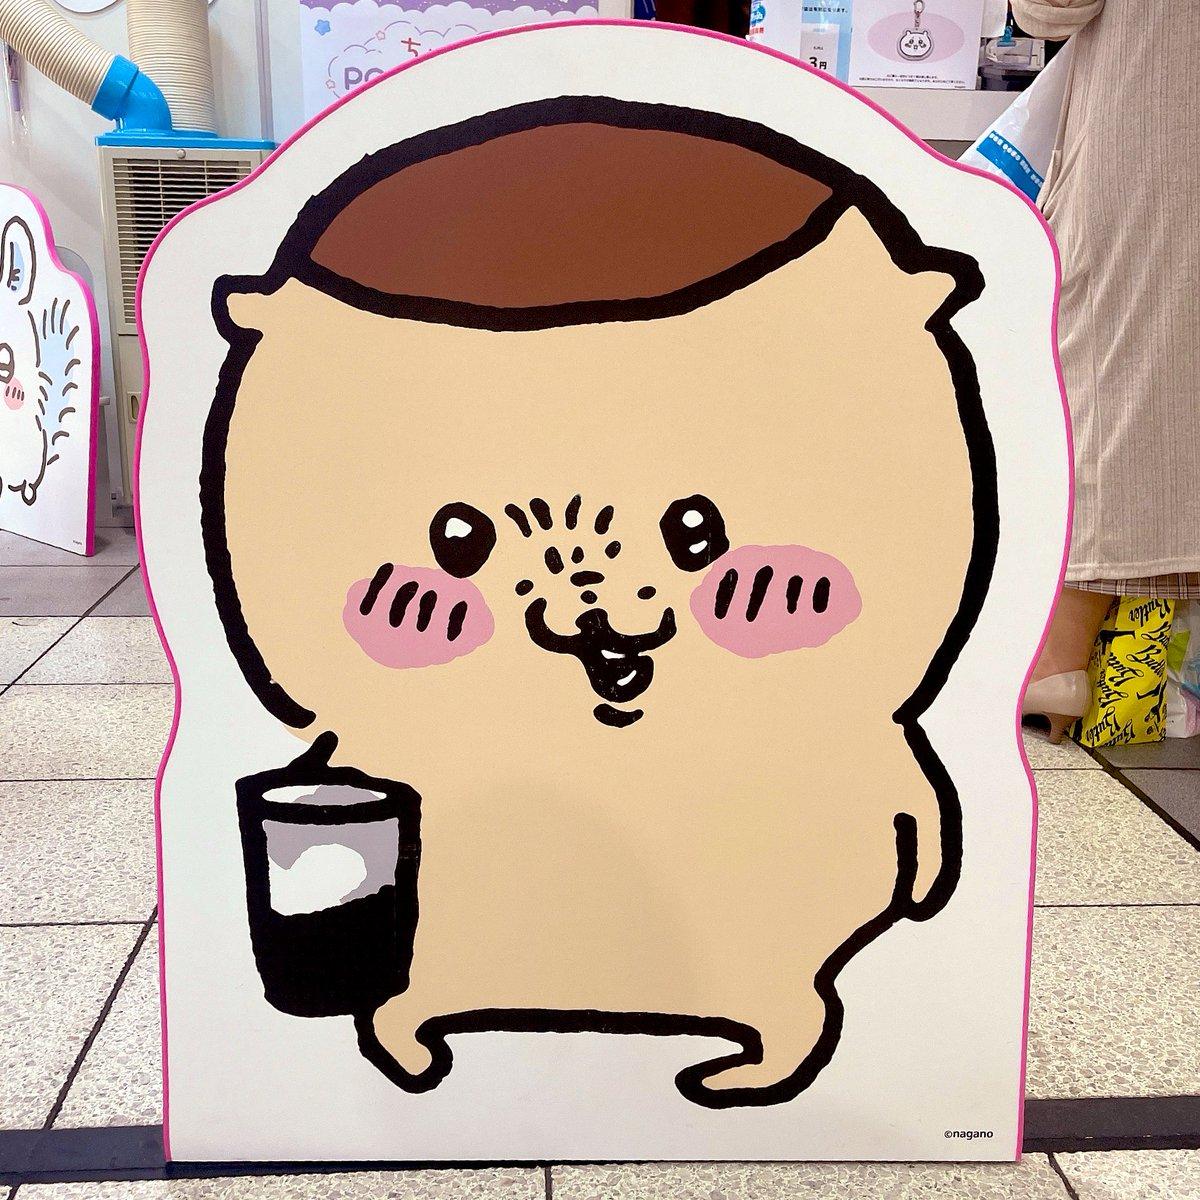 test ツイッターメディア - 栗まんじゅうパイセンに出会ったり、羽田空港に行ったり、忙しい1日だった。。 https://t.co/sUB5xc6a5S